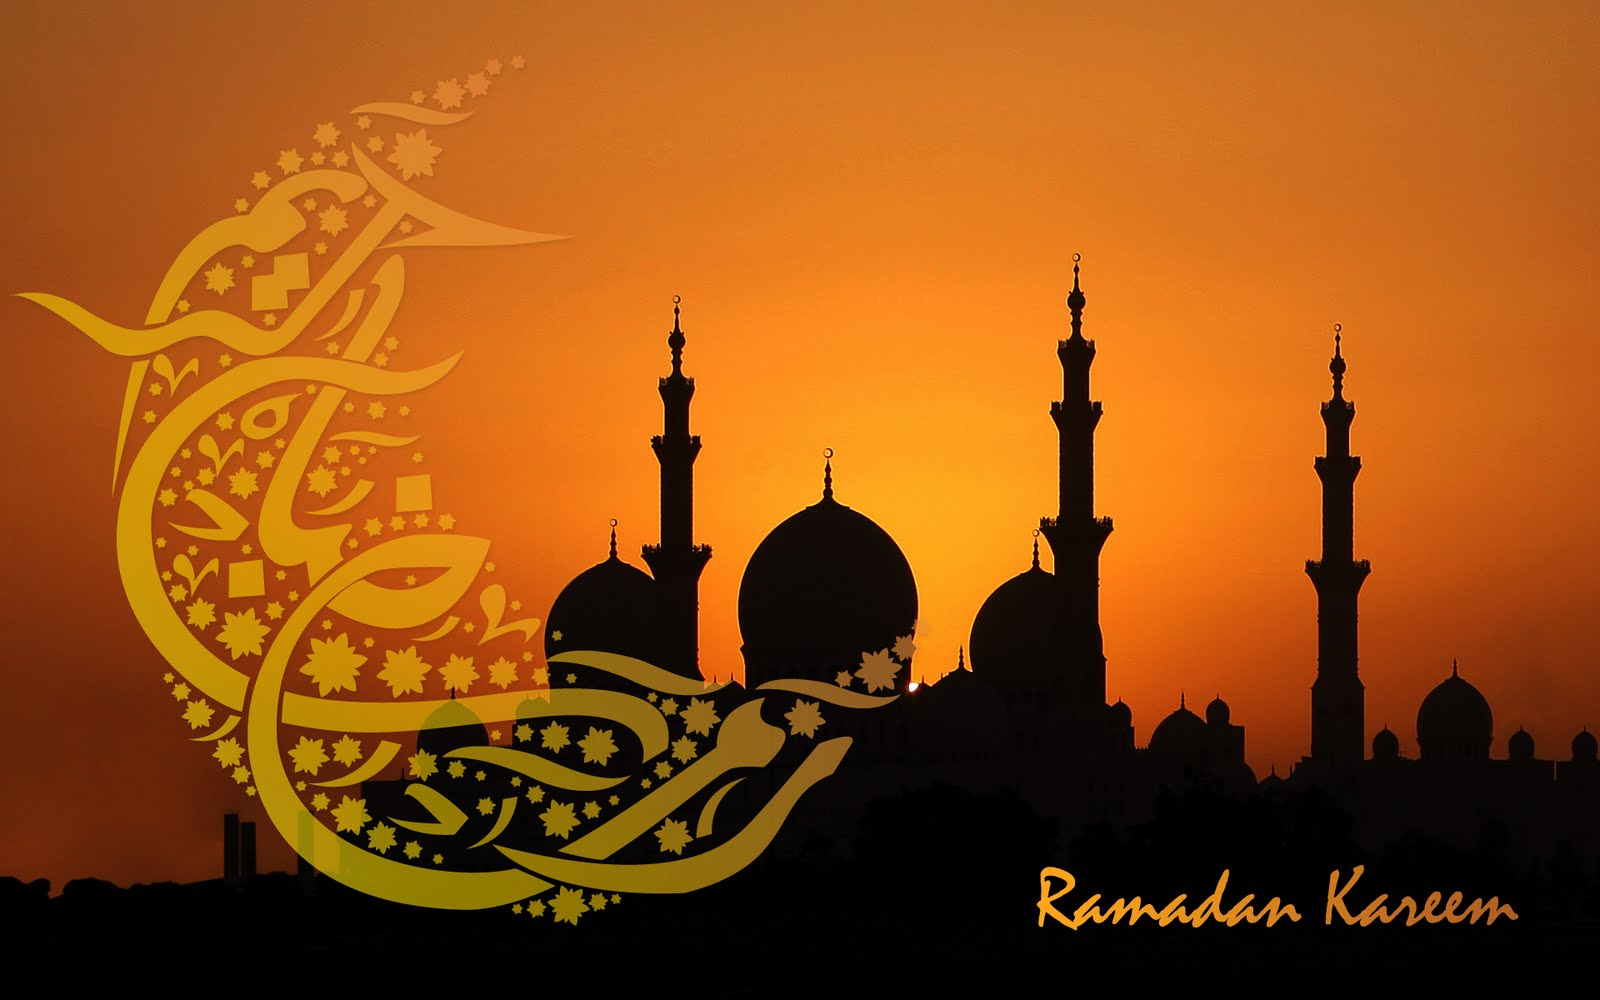 Поздравляем с месяцем Рамадан